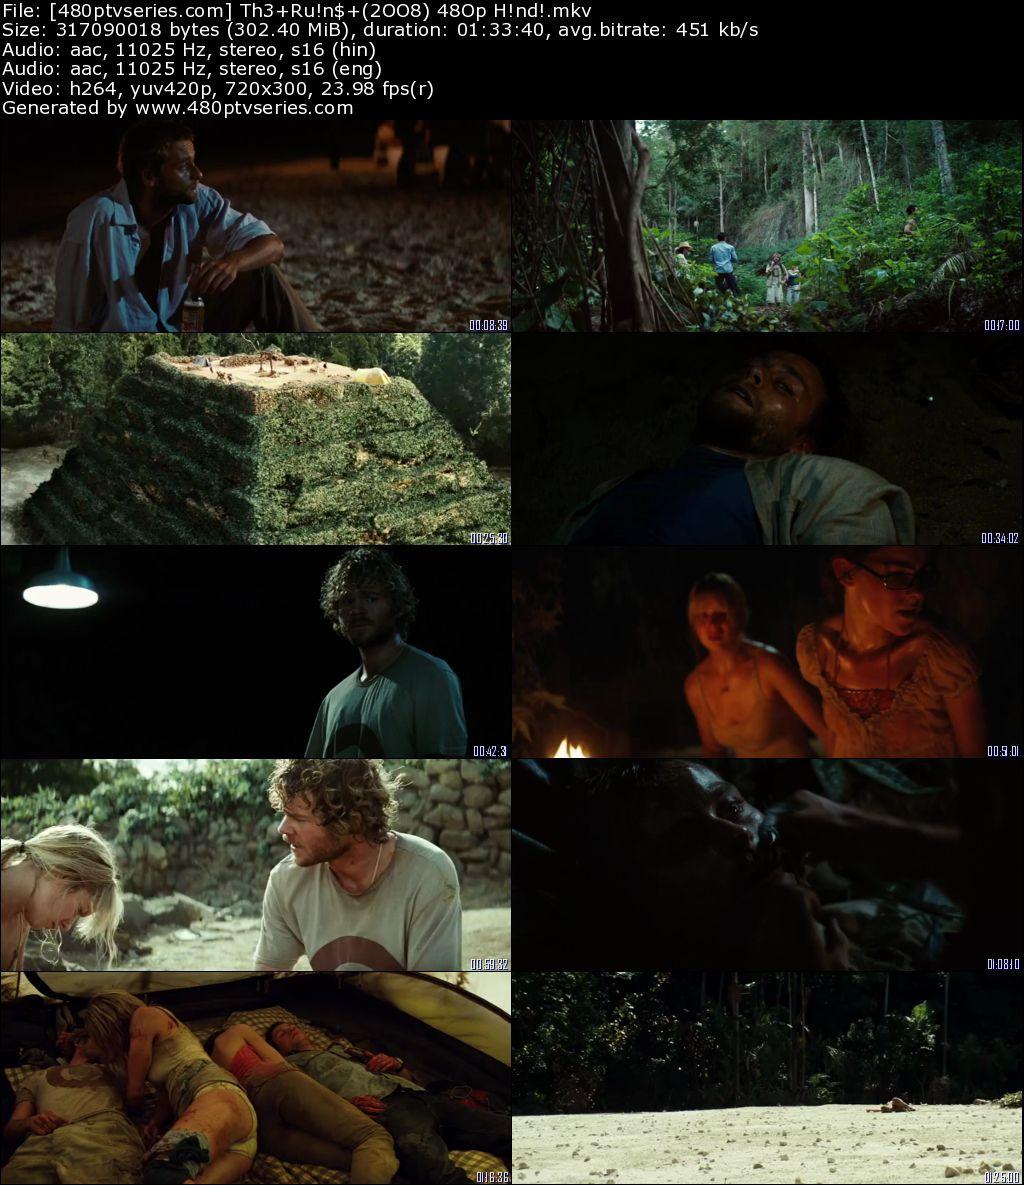 The Ruins 2008 Download Full Hindi Dual Audio Movie 480p 720p Bluray Free Watch Online Full Movie Download Worldfree4u 9xmovies